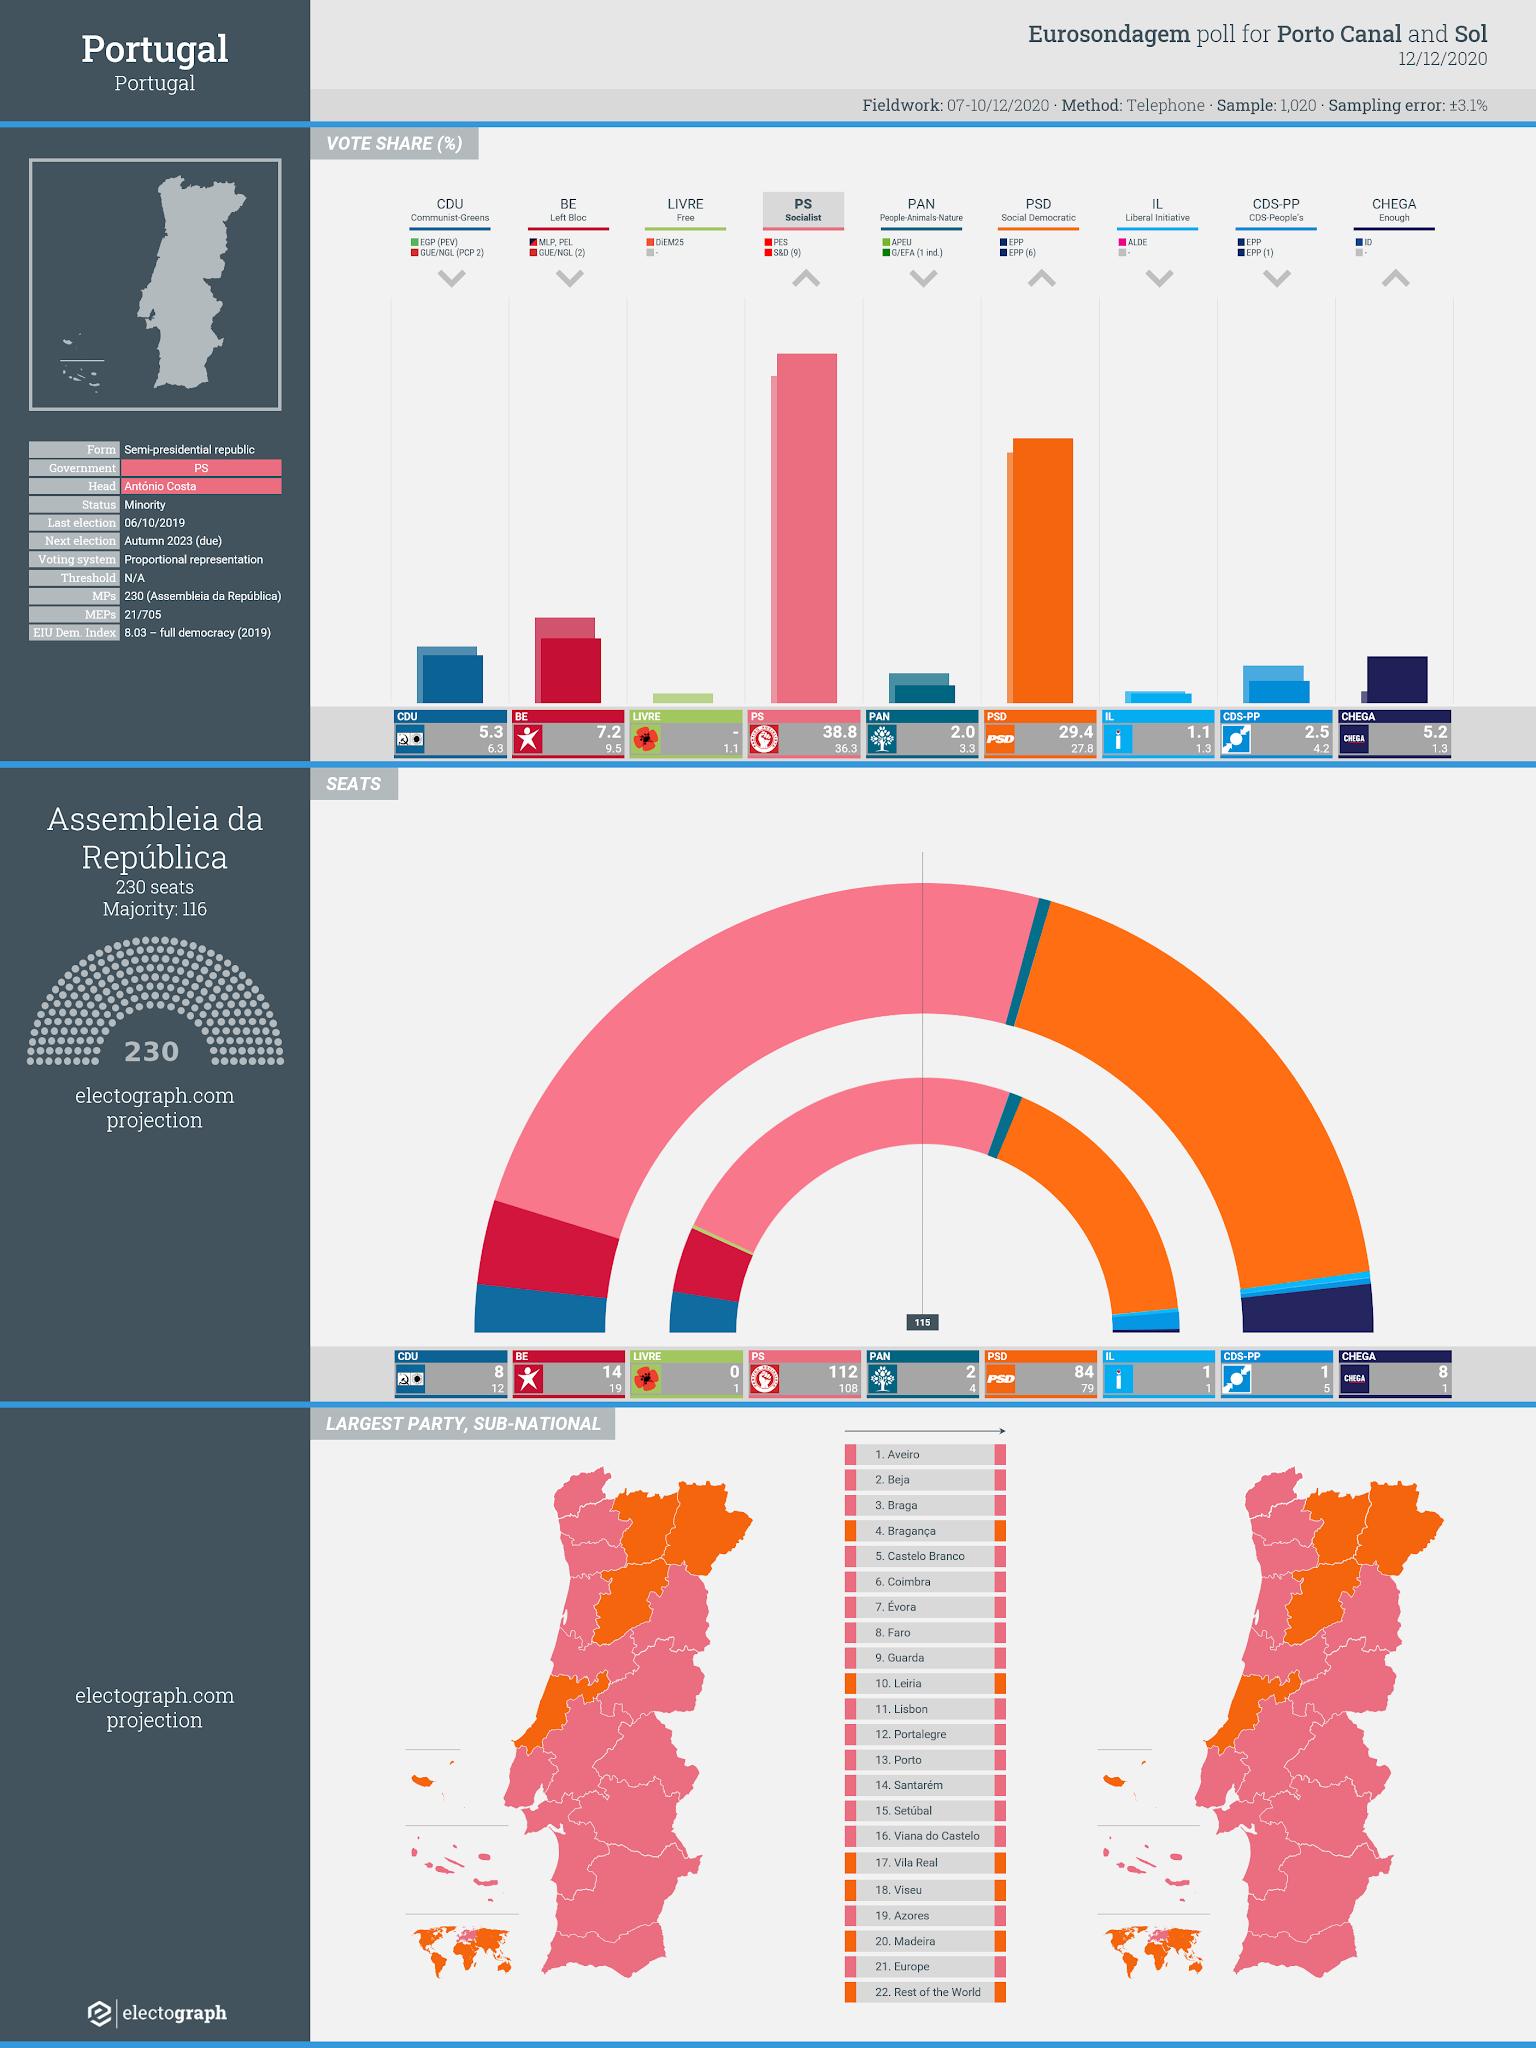 PORTUGAL: Eurosondagem poll chart for Sol and Porto Canal, 12 December 2020